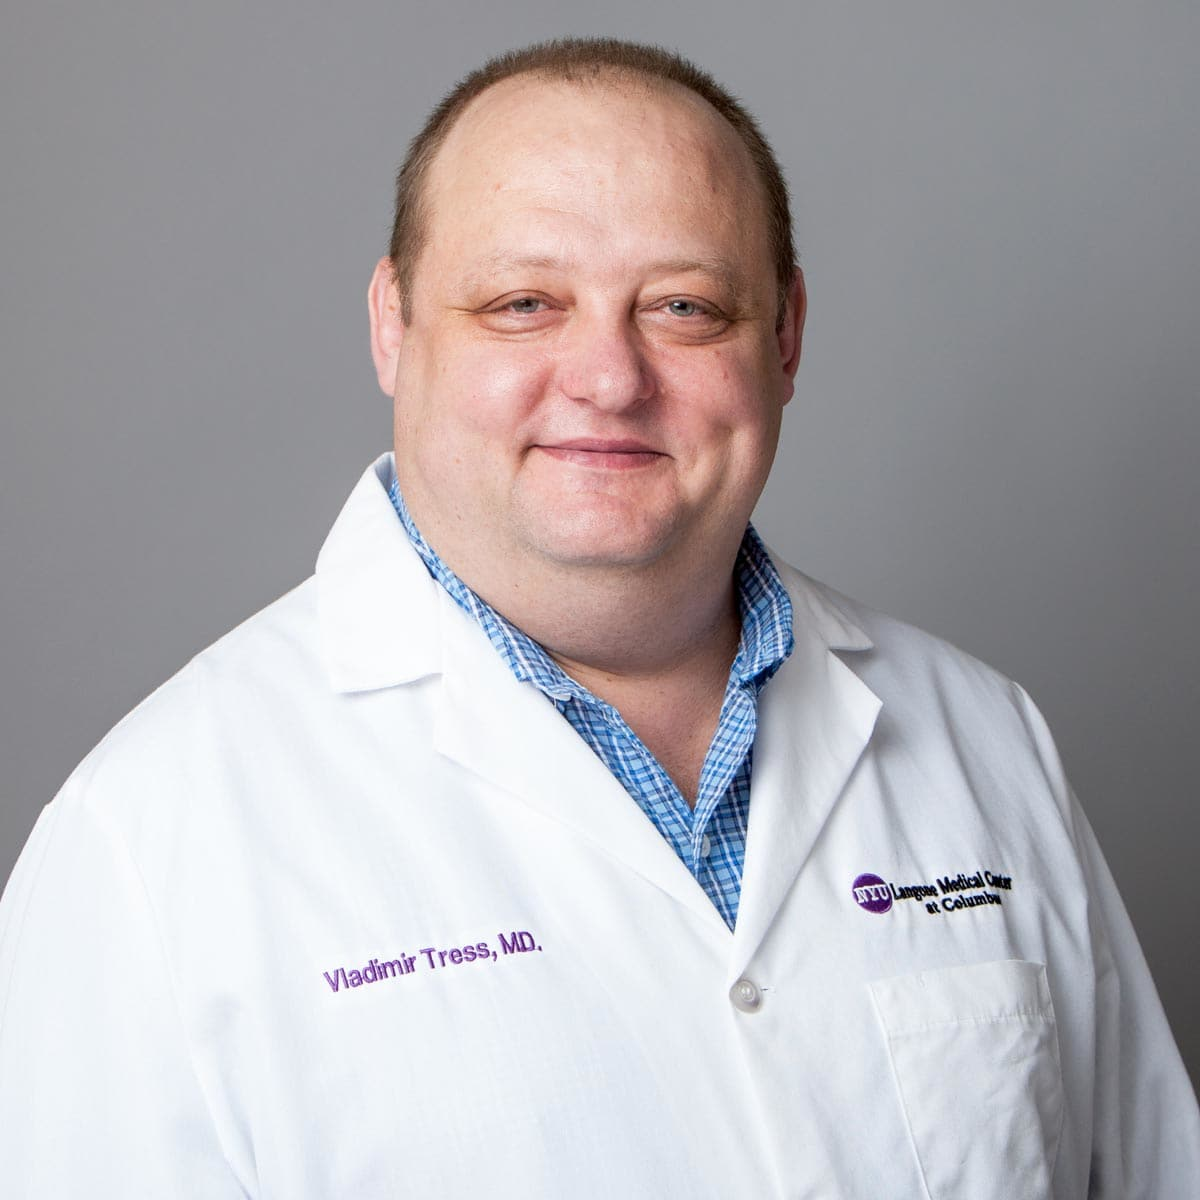 Vladimir Tress, MD Orthopaedic Surgery